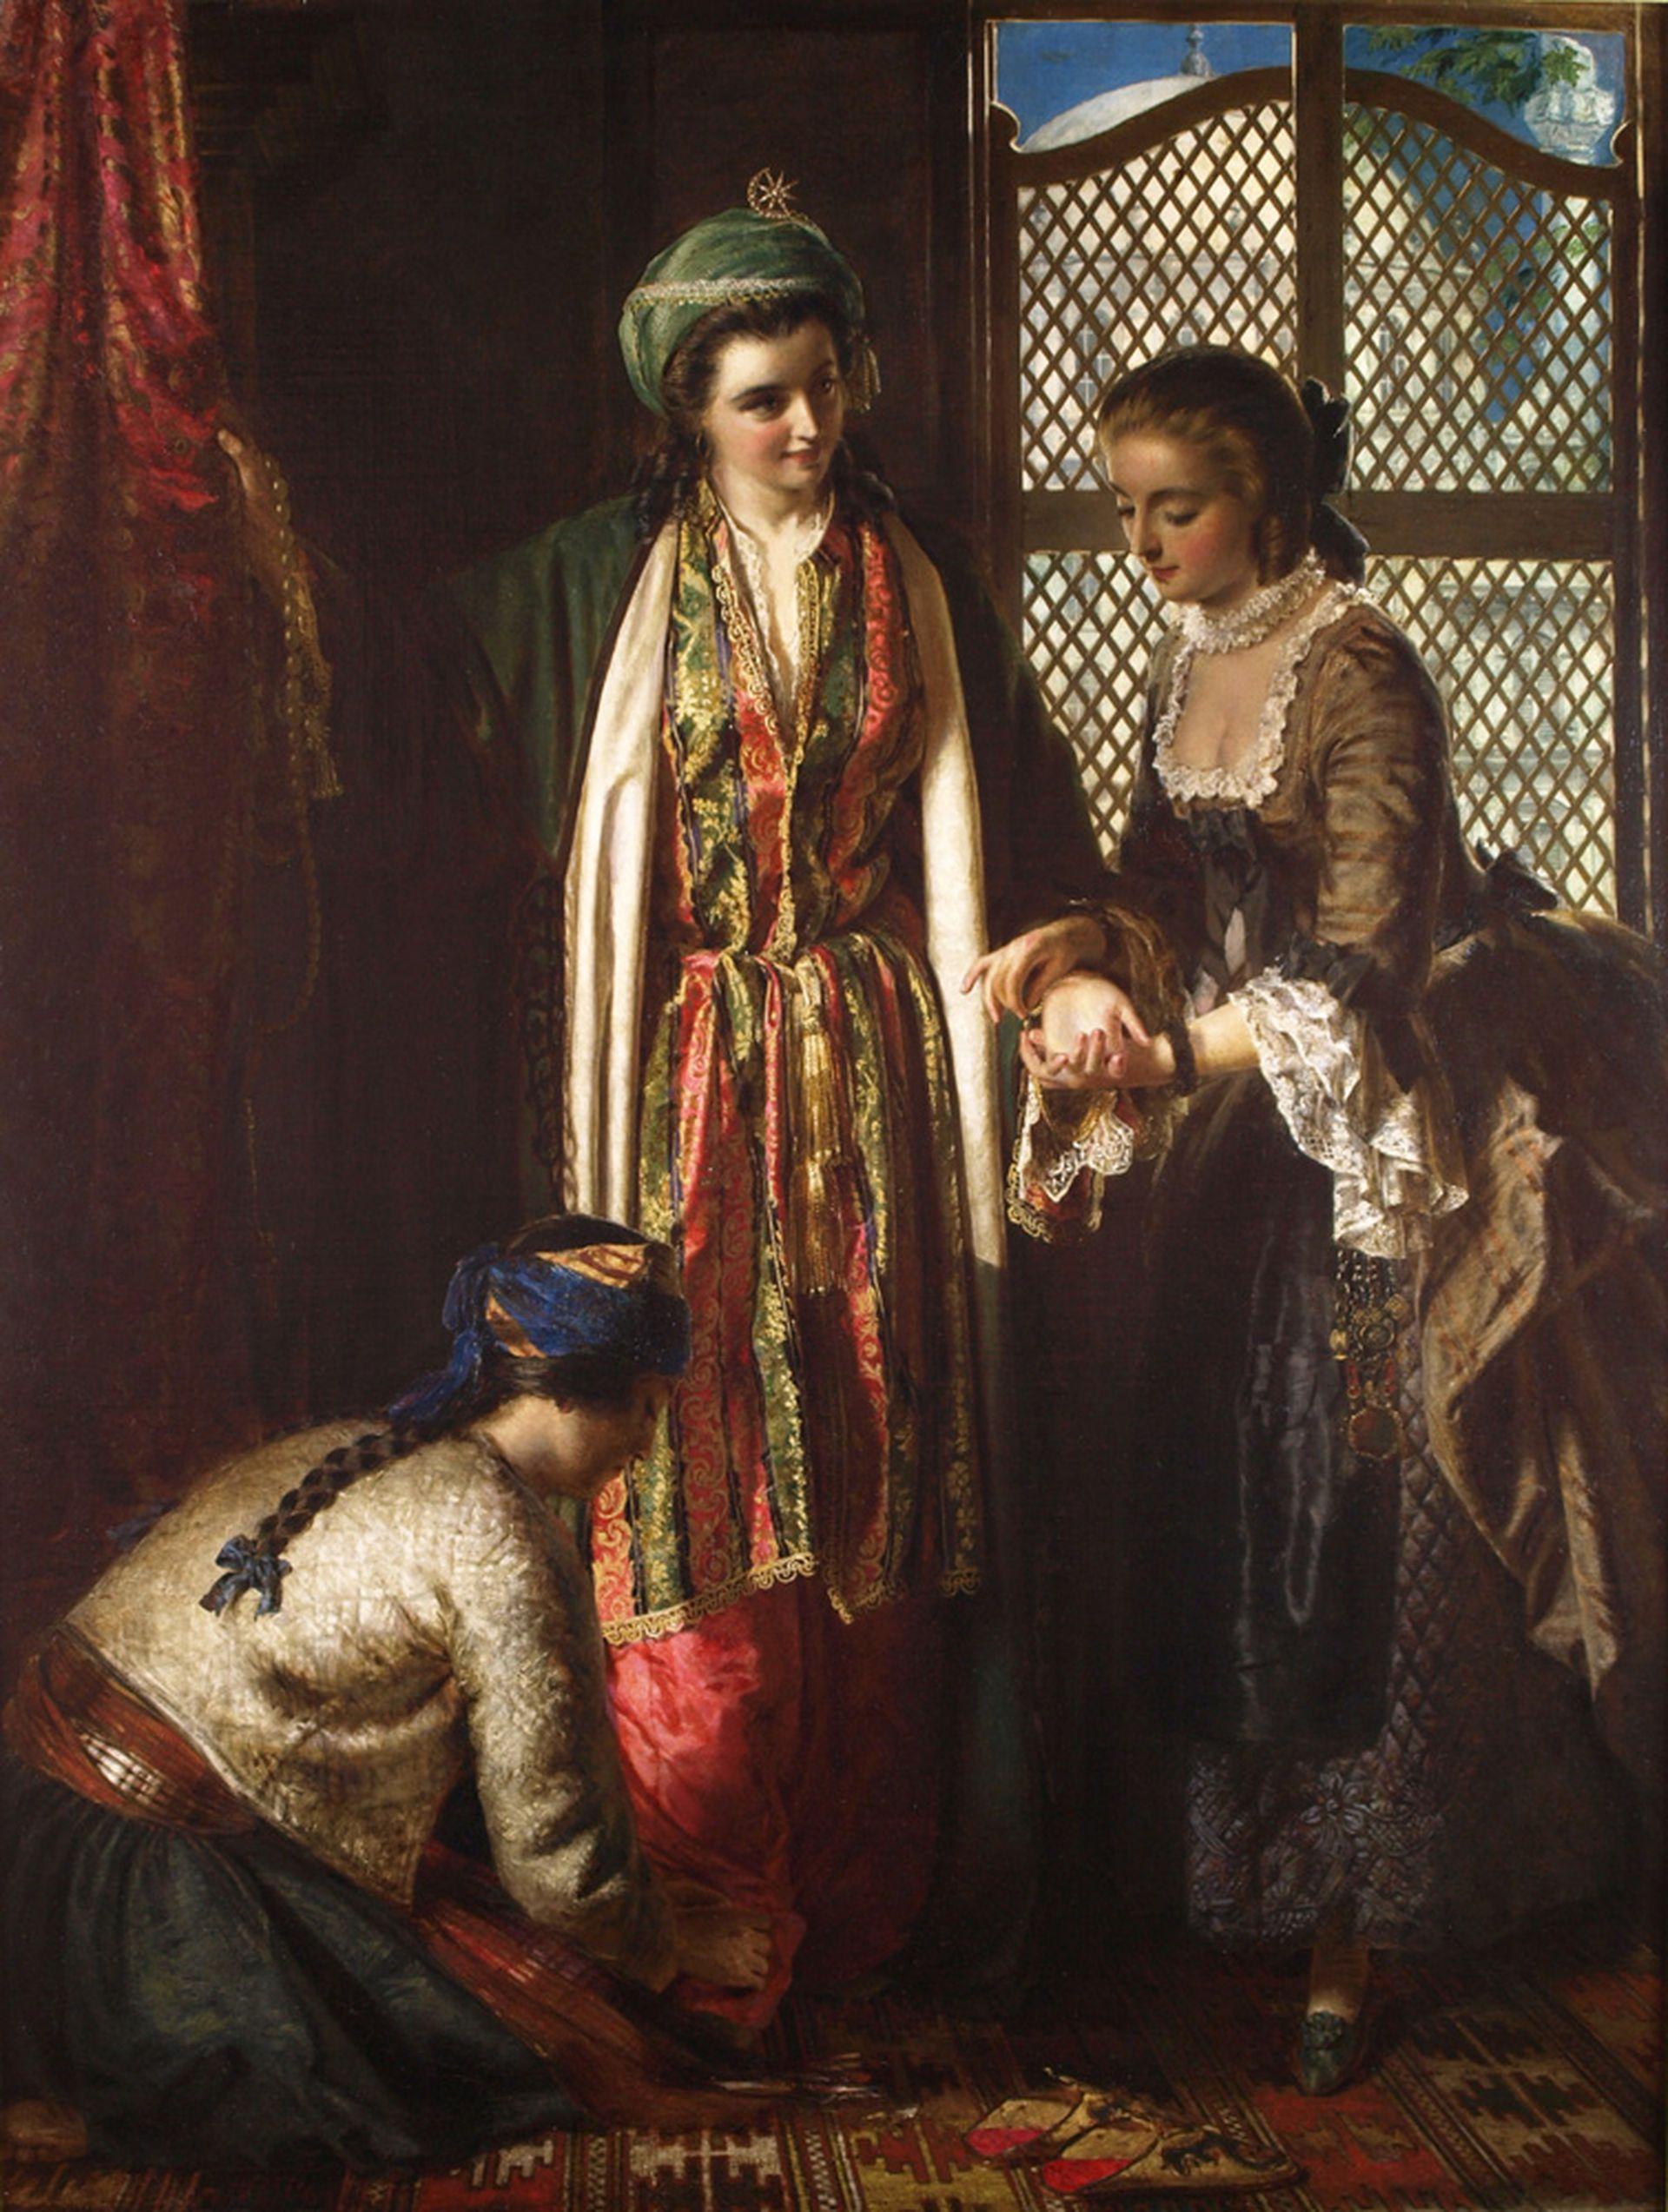 """Lady Mary Montagu en Turquía"", obra de Jerry Barrett"